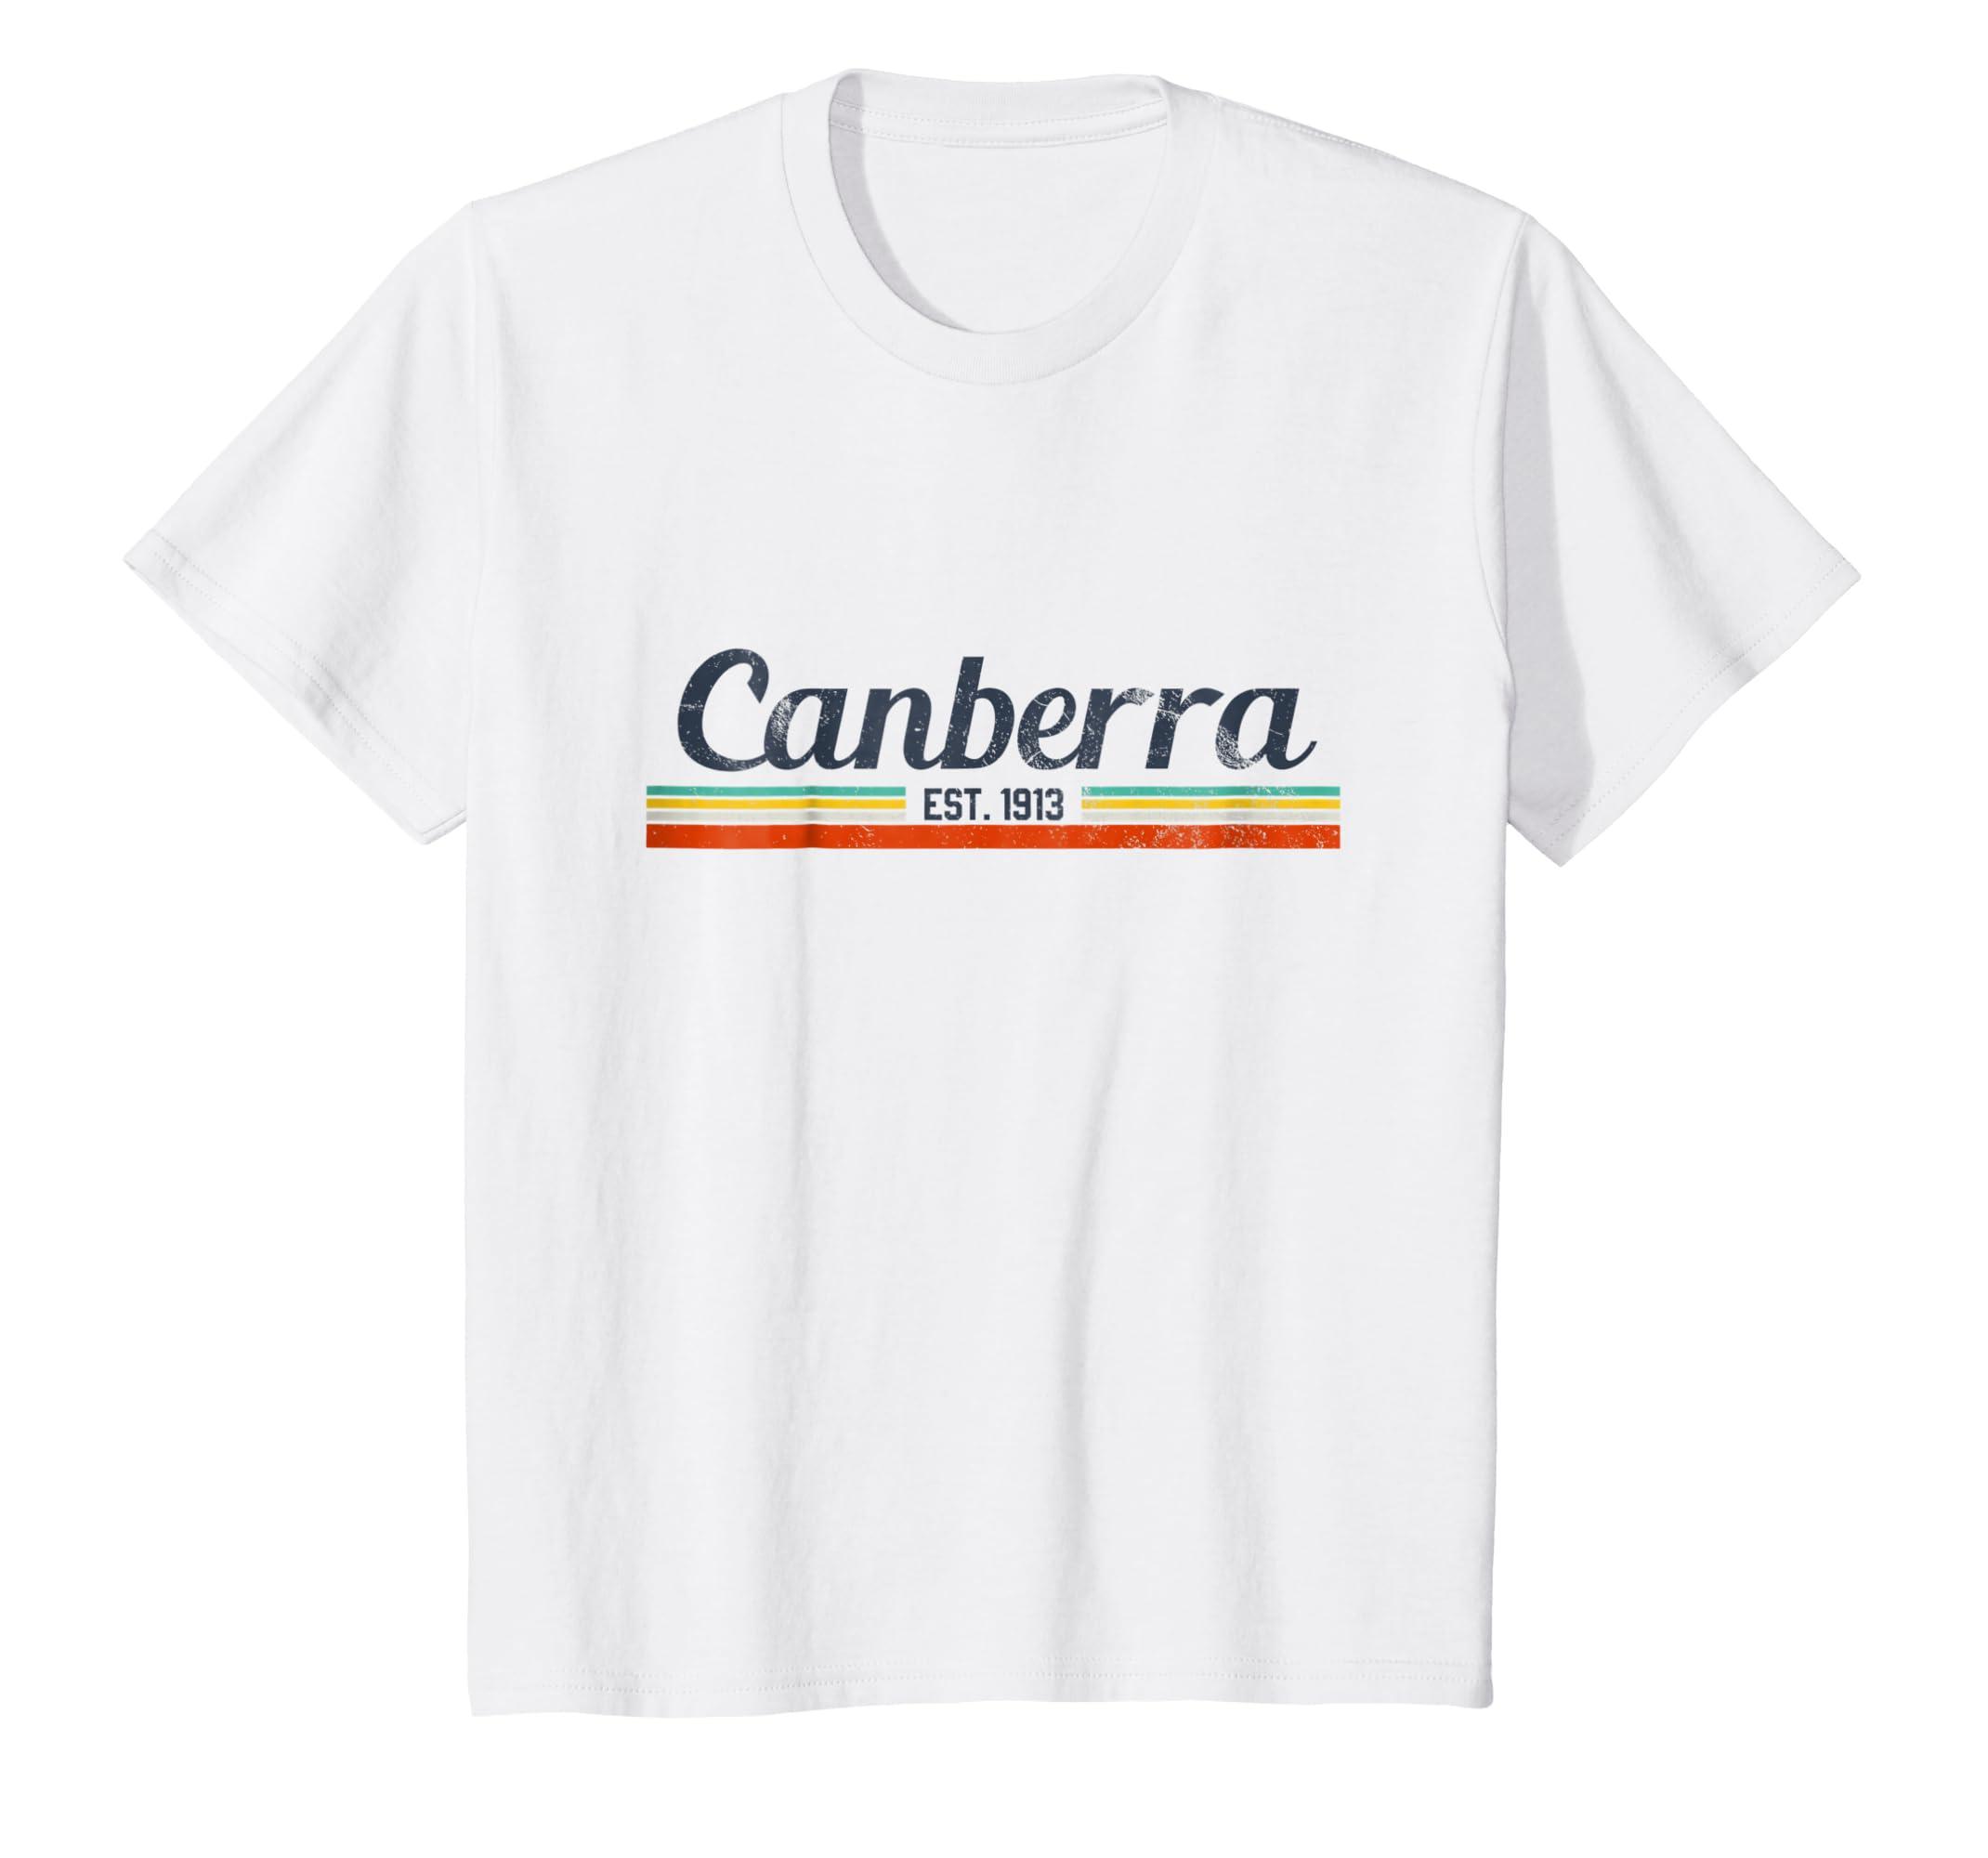 d32603c4af Amazon.com: Canberra T-Shirt - Vintage Retro Australia Shirt Gift ...